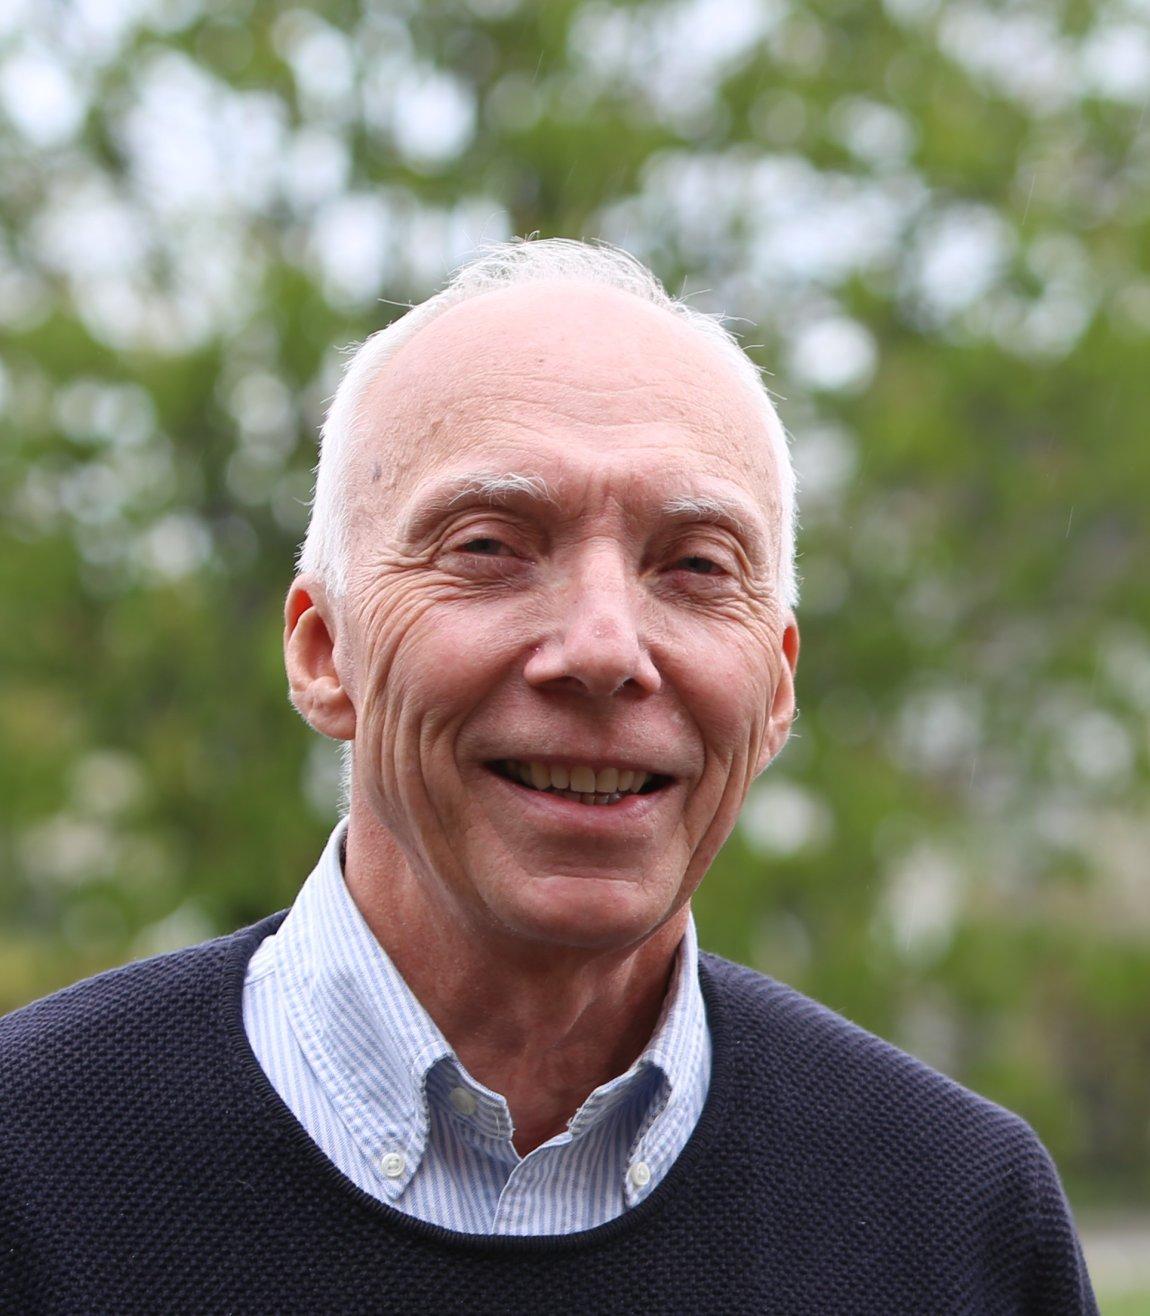 Senterpartiets innlegg i kommunestyremøte 23.6.2021 om Perspektivmeldingen